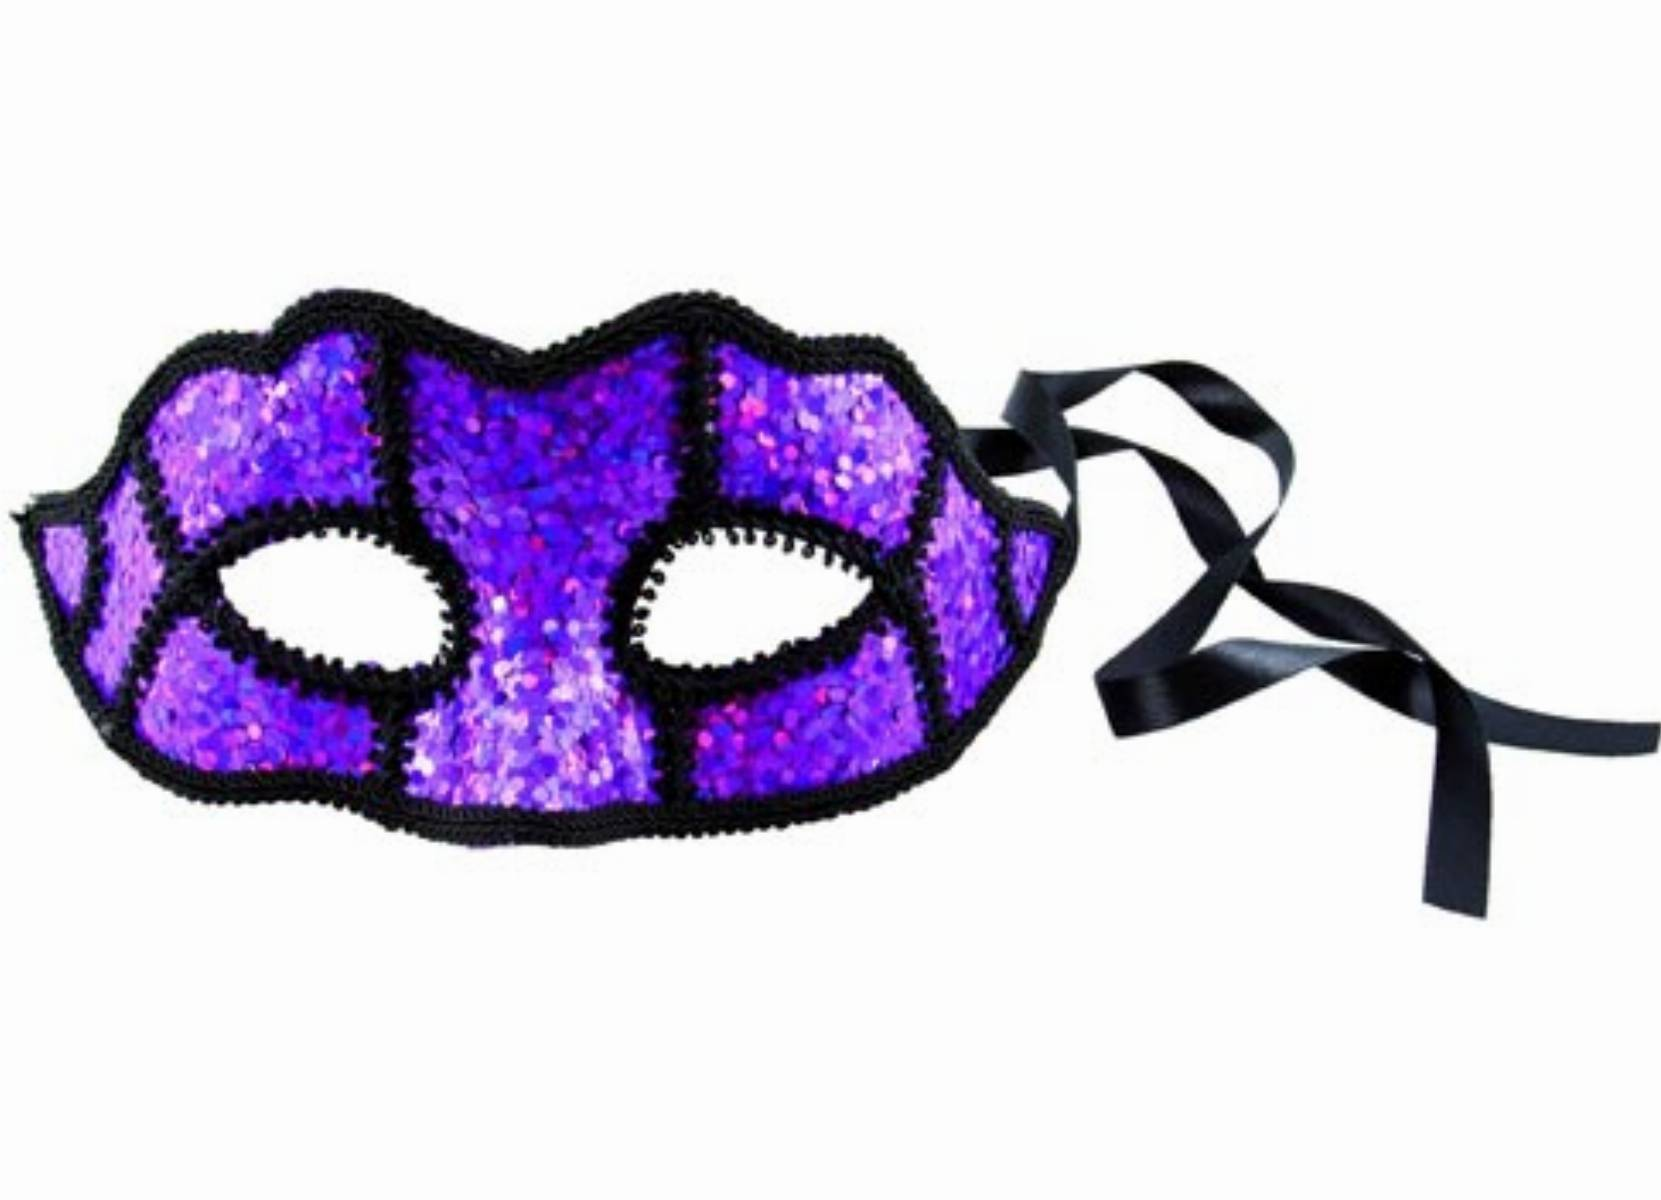 Maska SIX na Halloween - 64,90 zł